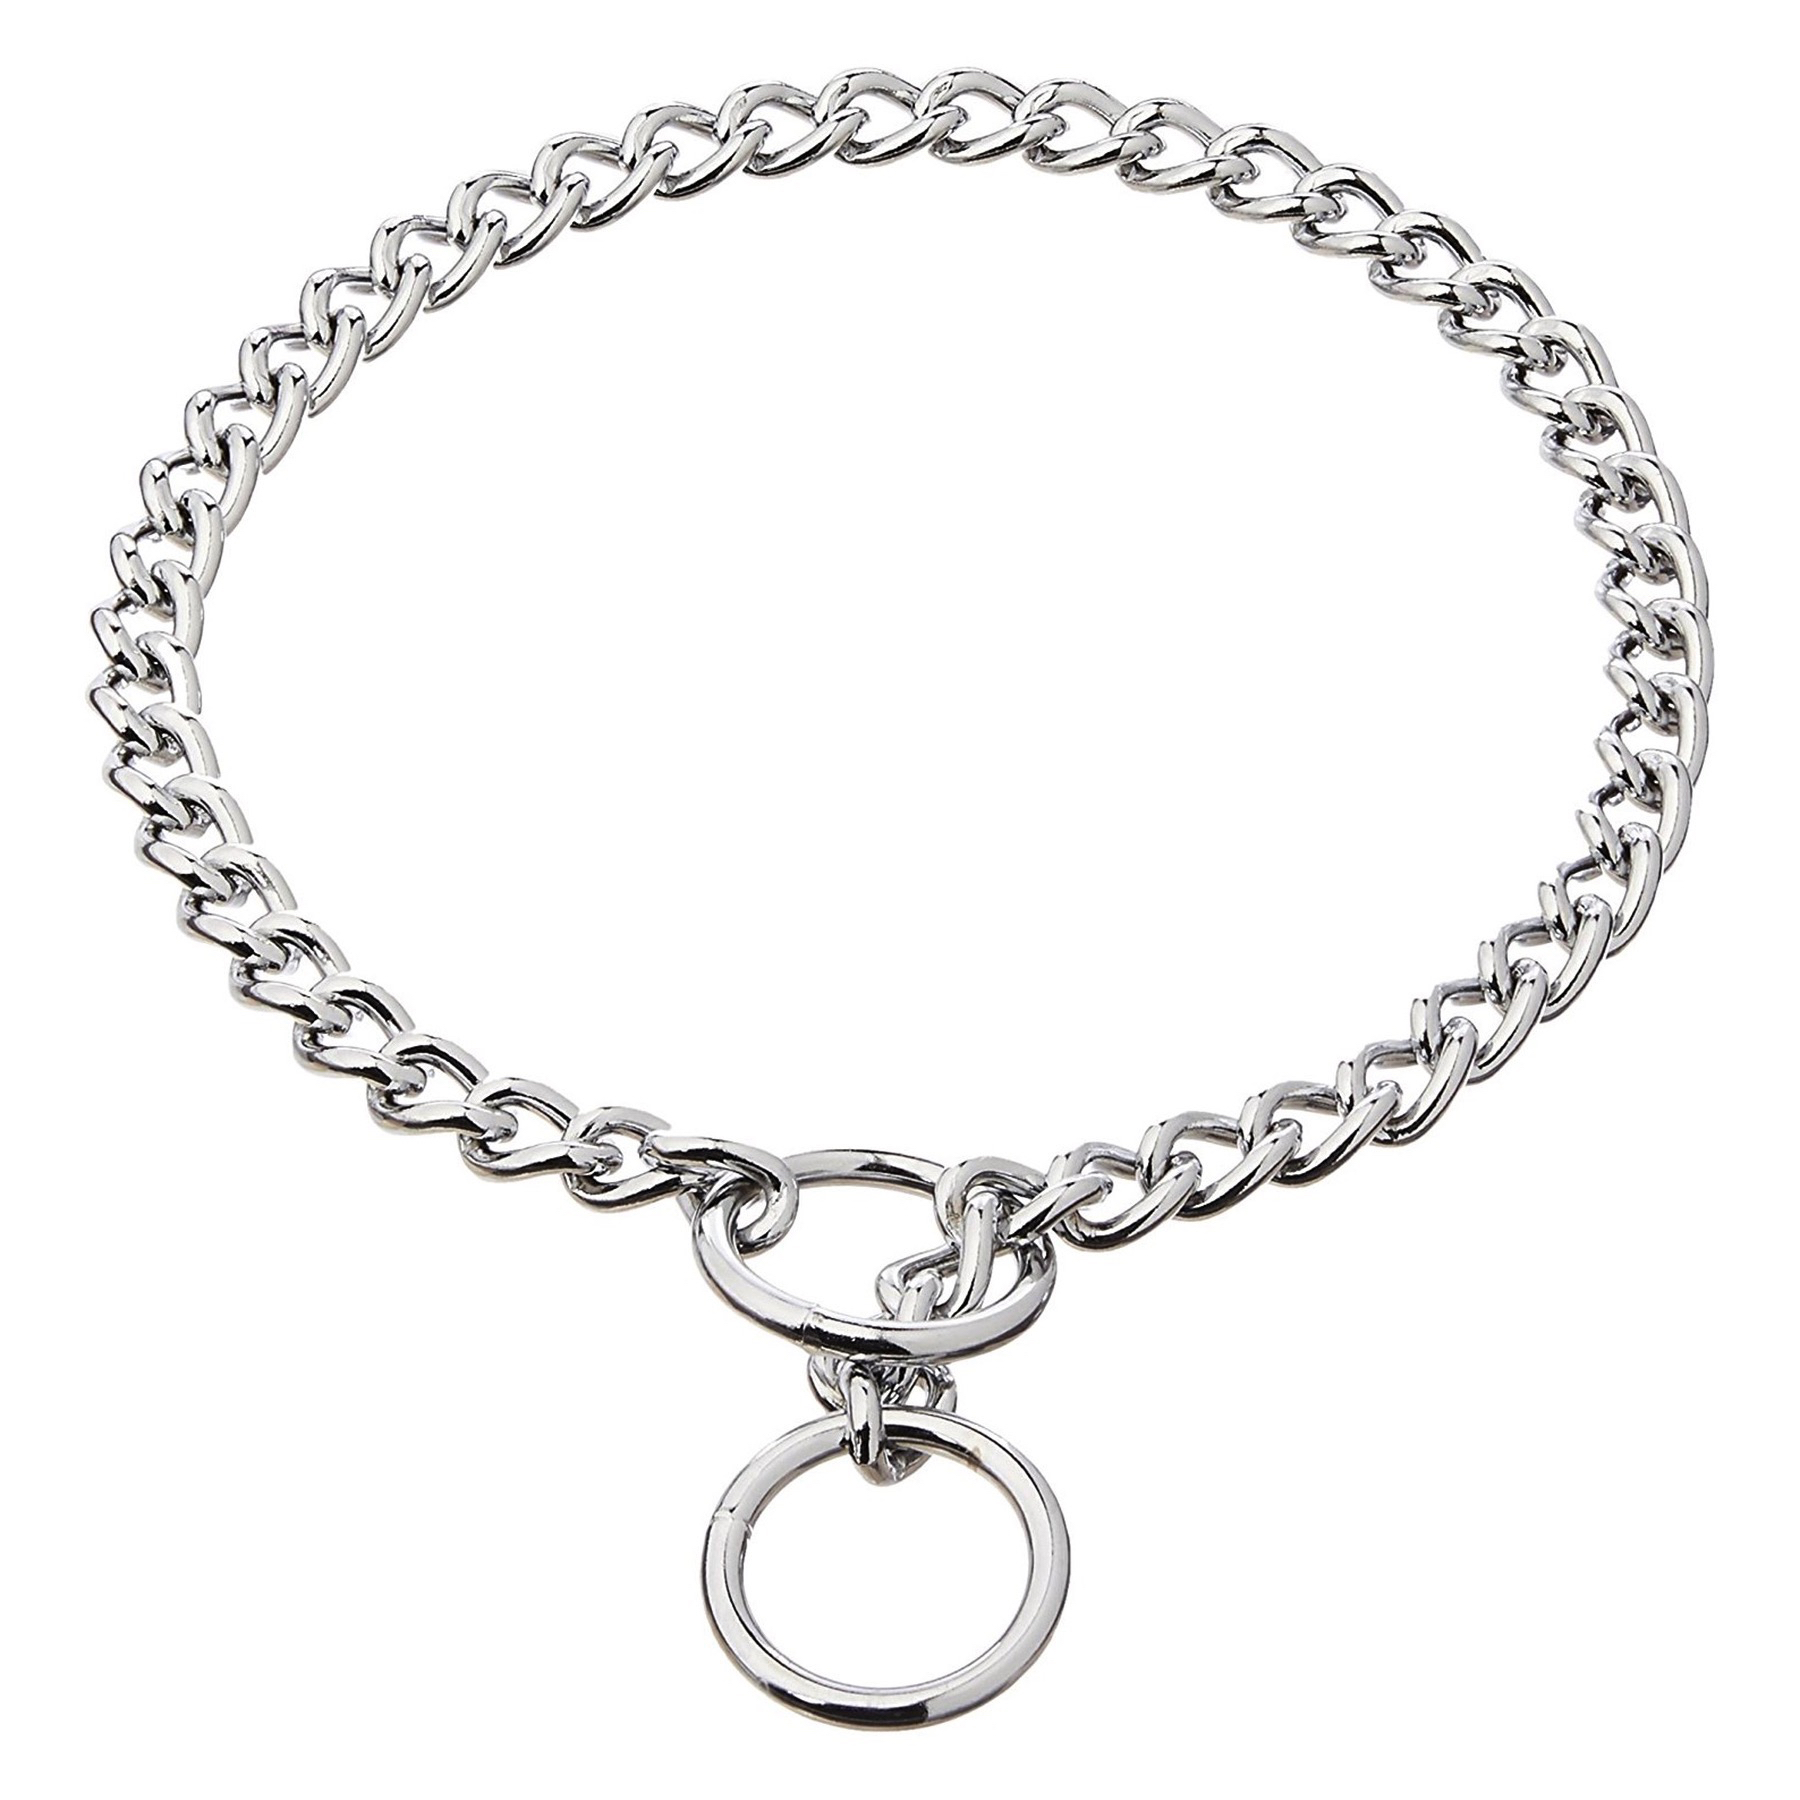 COASTAL PET 20 in Titan Heavy Chain Choke Collar